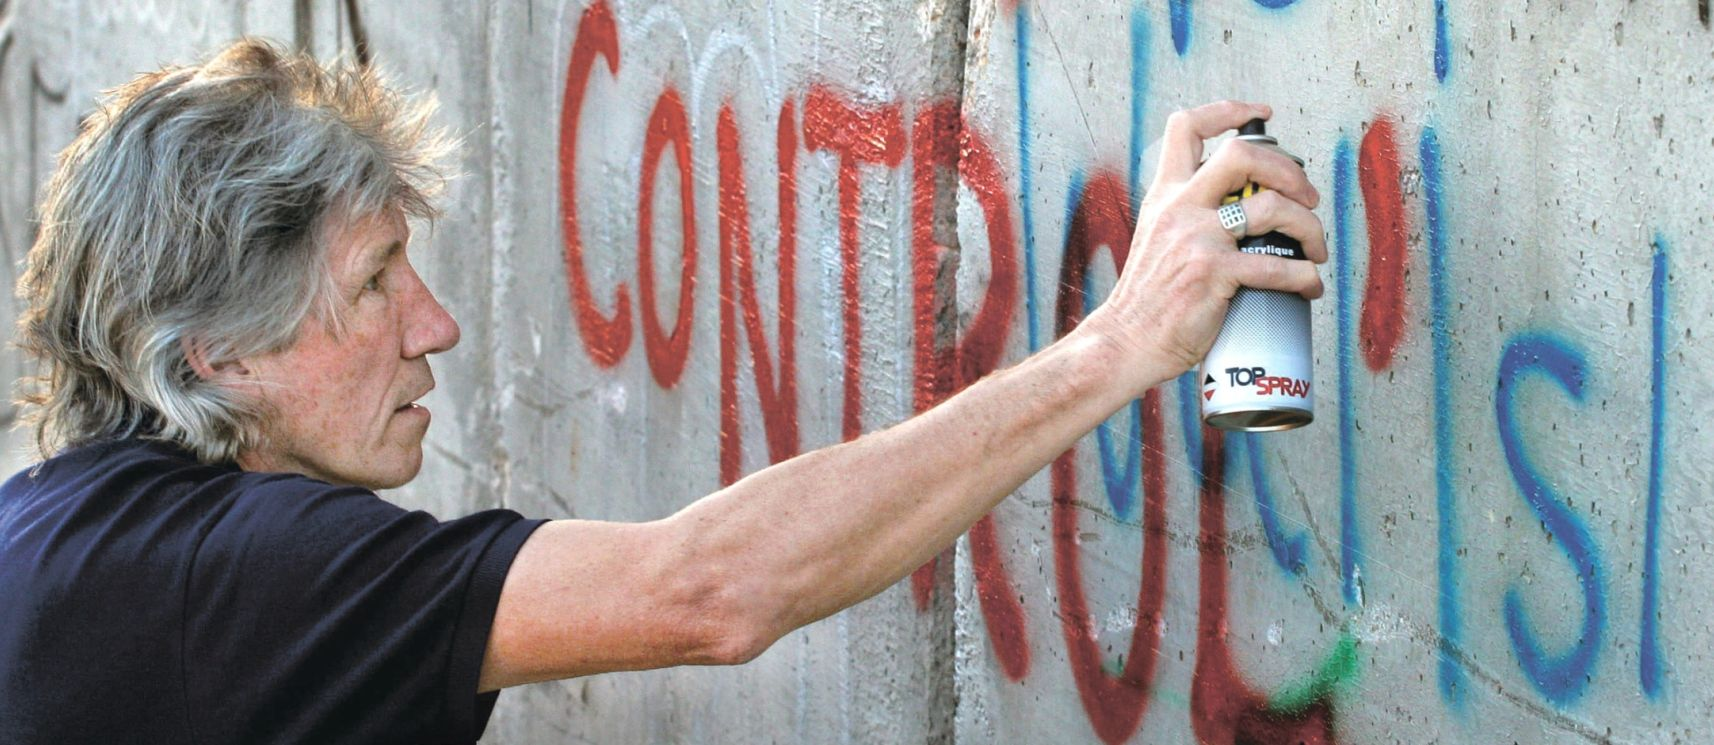 Vajon Roger Waters békeaktivista vagy antiszemita?